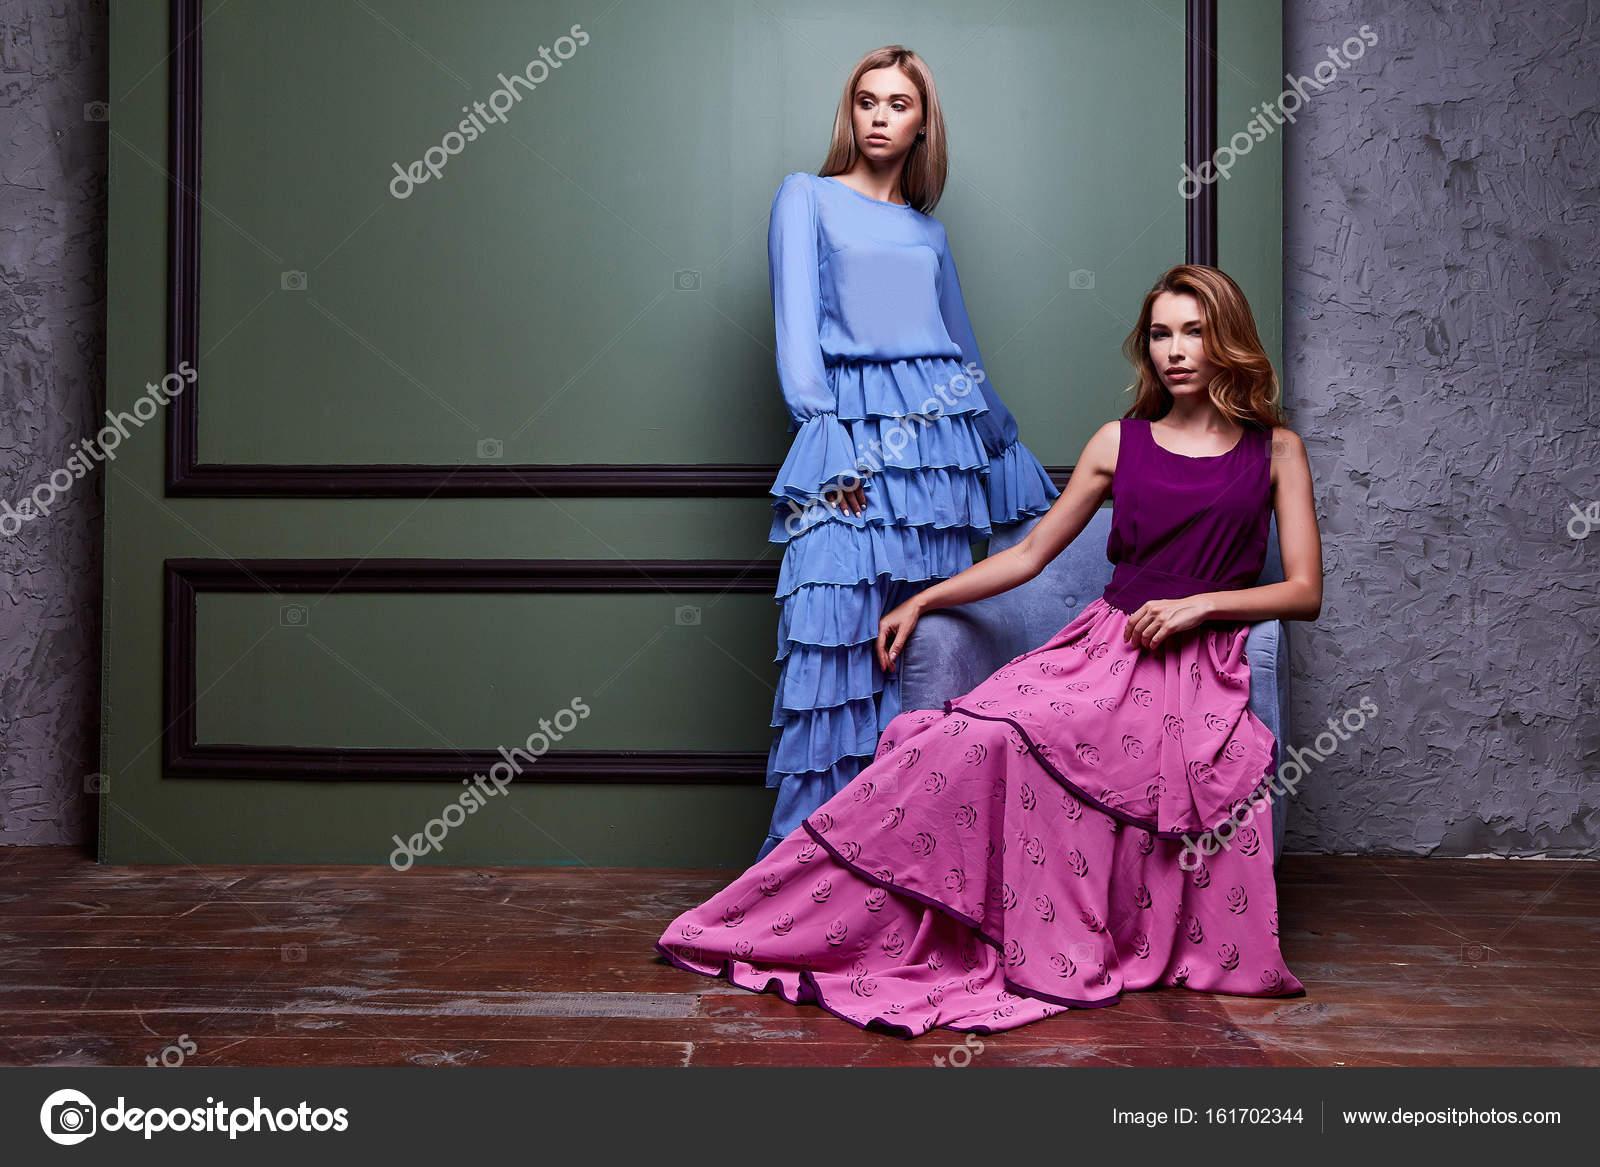 ea2ed80f12f6 Δύο όμορφες σέξι ξανθιά yang γυναίκα κυρία αρκετά φορούν μακρύ φόρεμα κόμμα  αρτιότερες ημερομηνία σύσκεψης διασημότητα Μόδα στυλ σχεδιαστής εμφάνιση ...